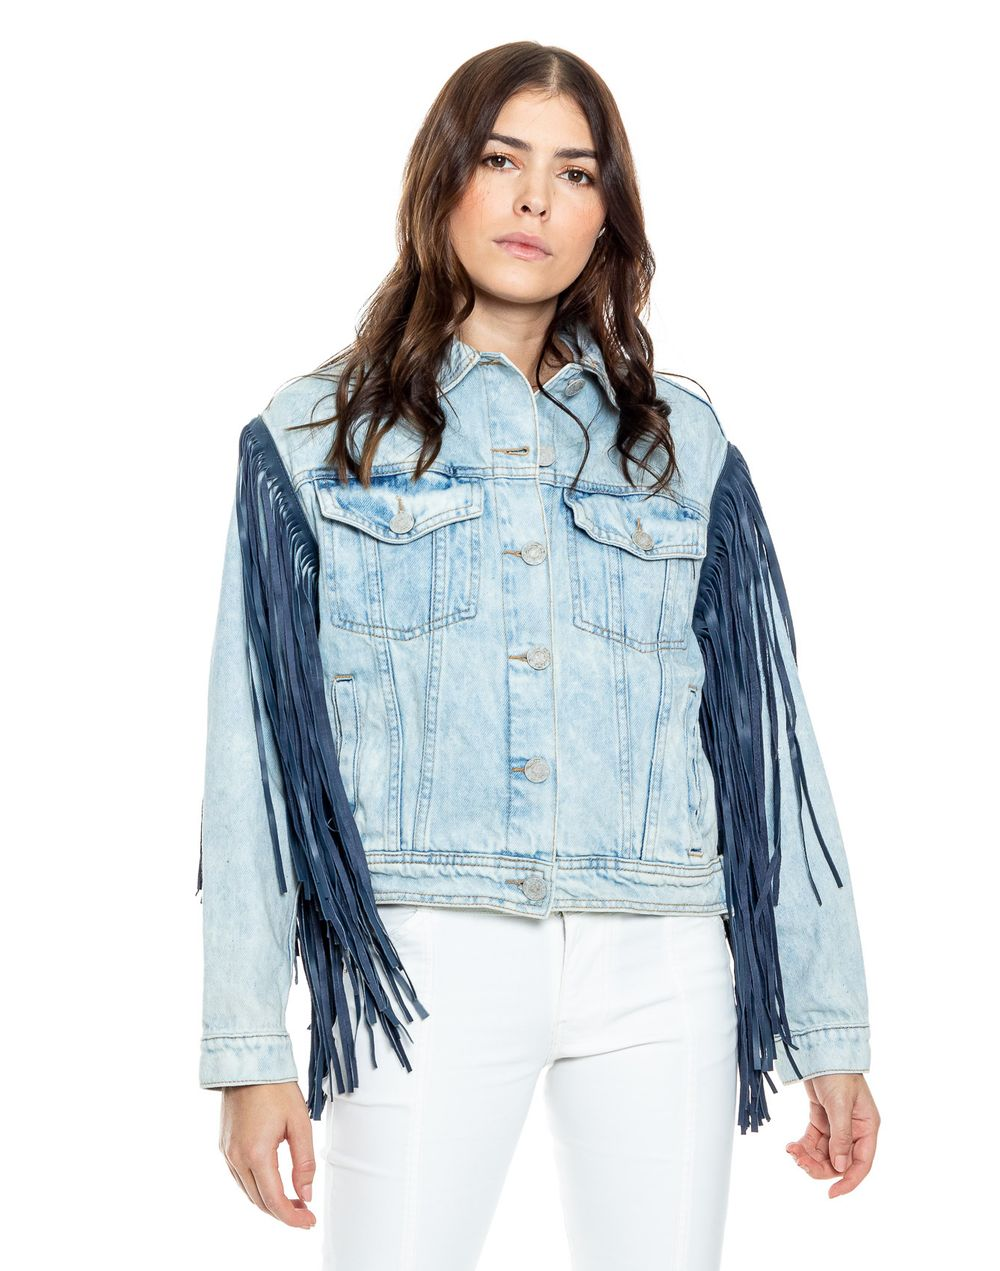 chaqueta-043504-azul-4.jpg